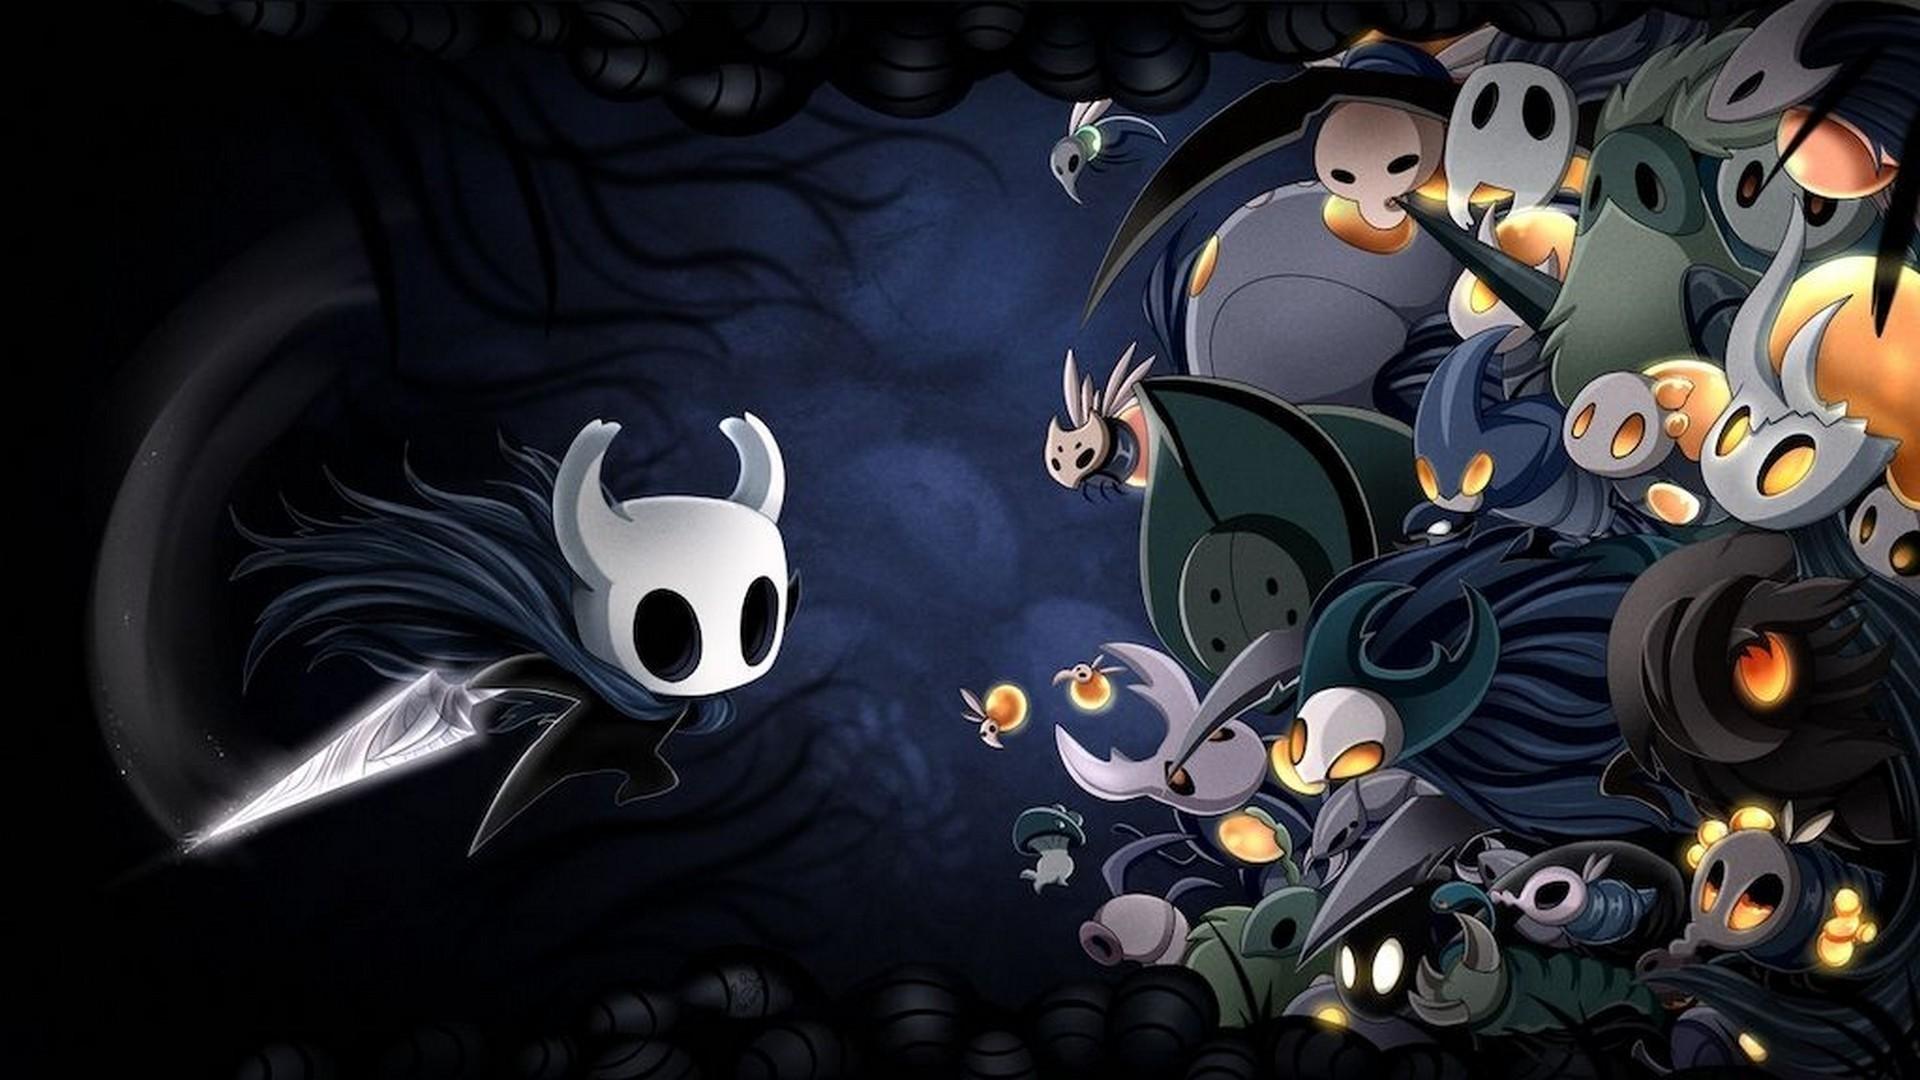 Hollow Knight Full HD Wallpaper